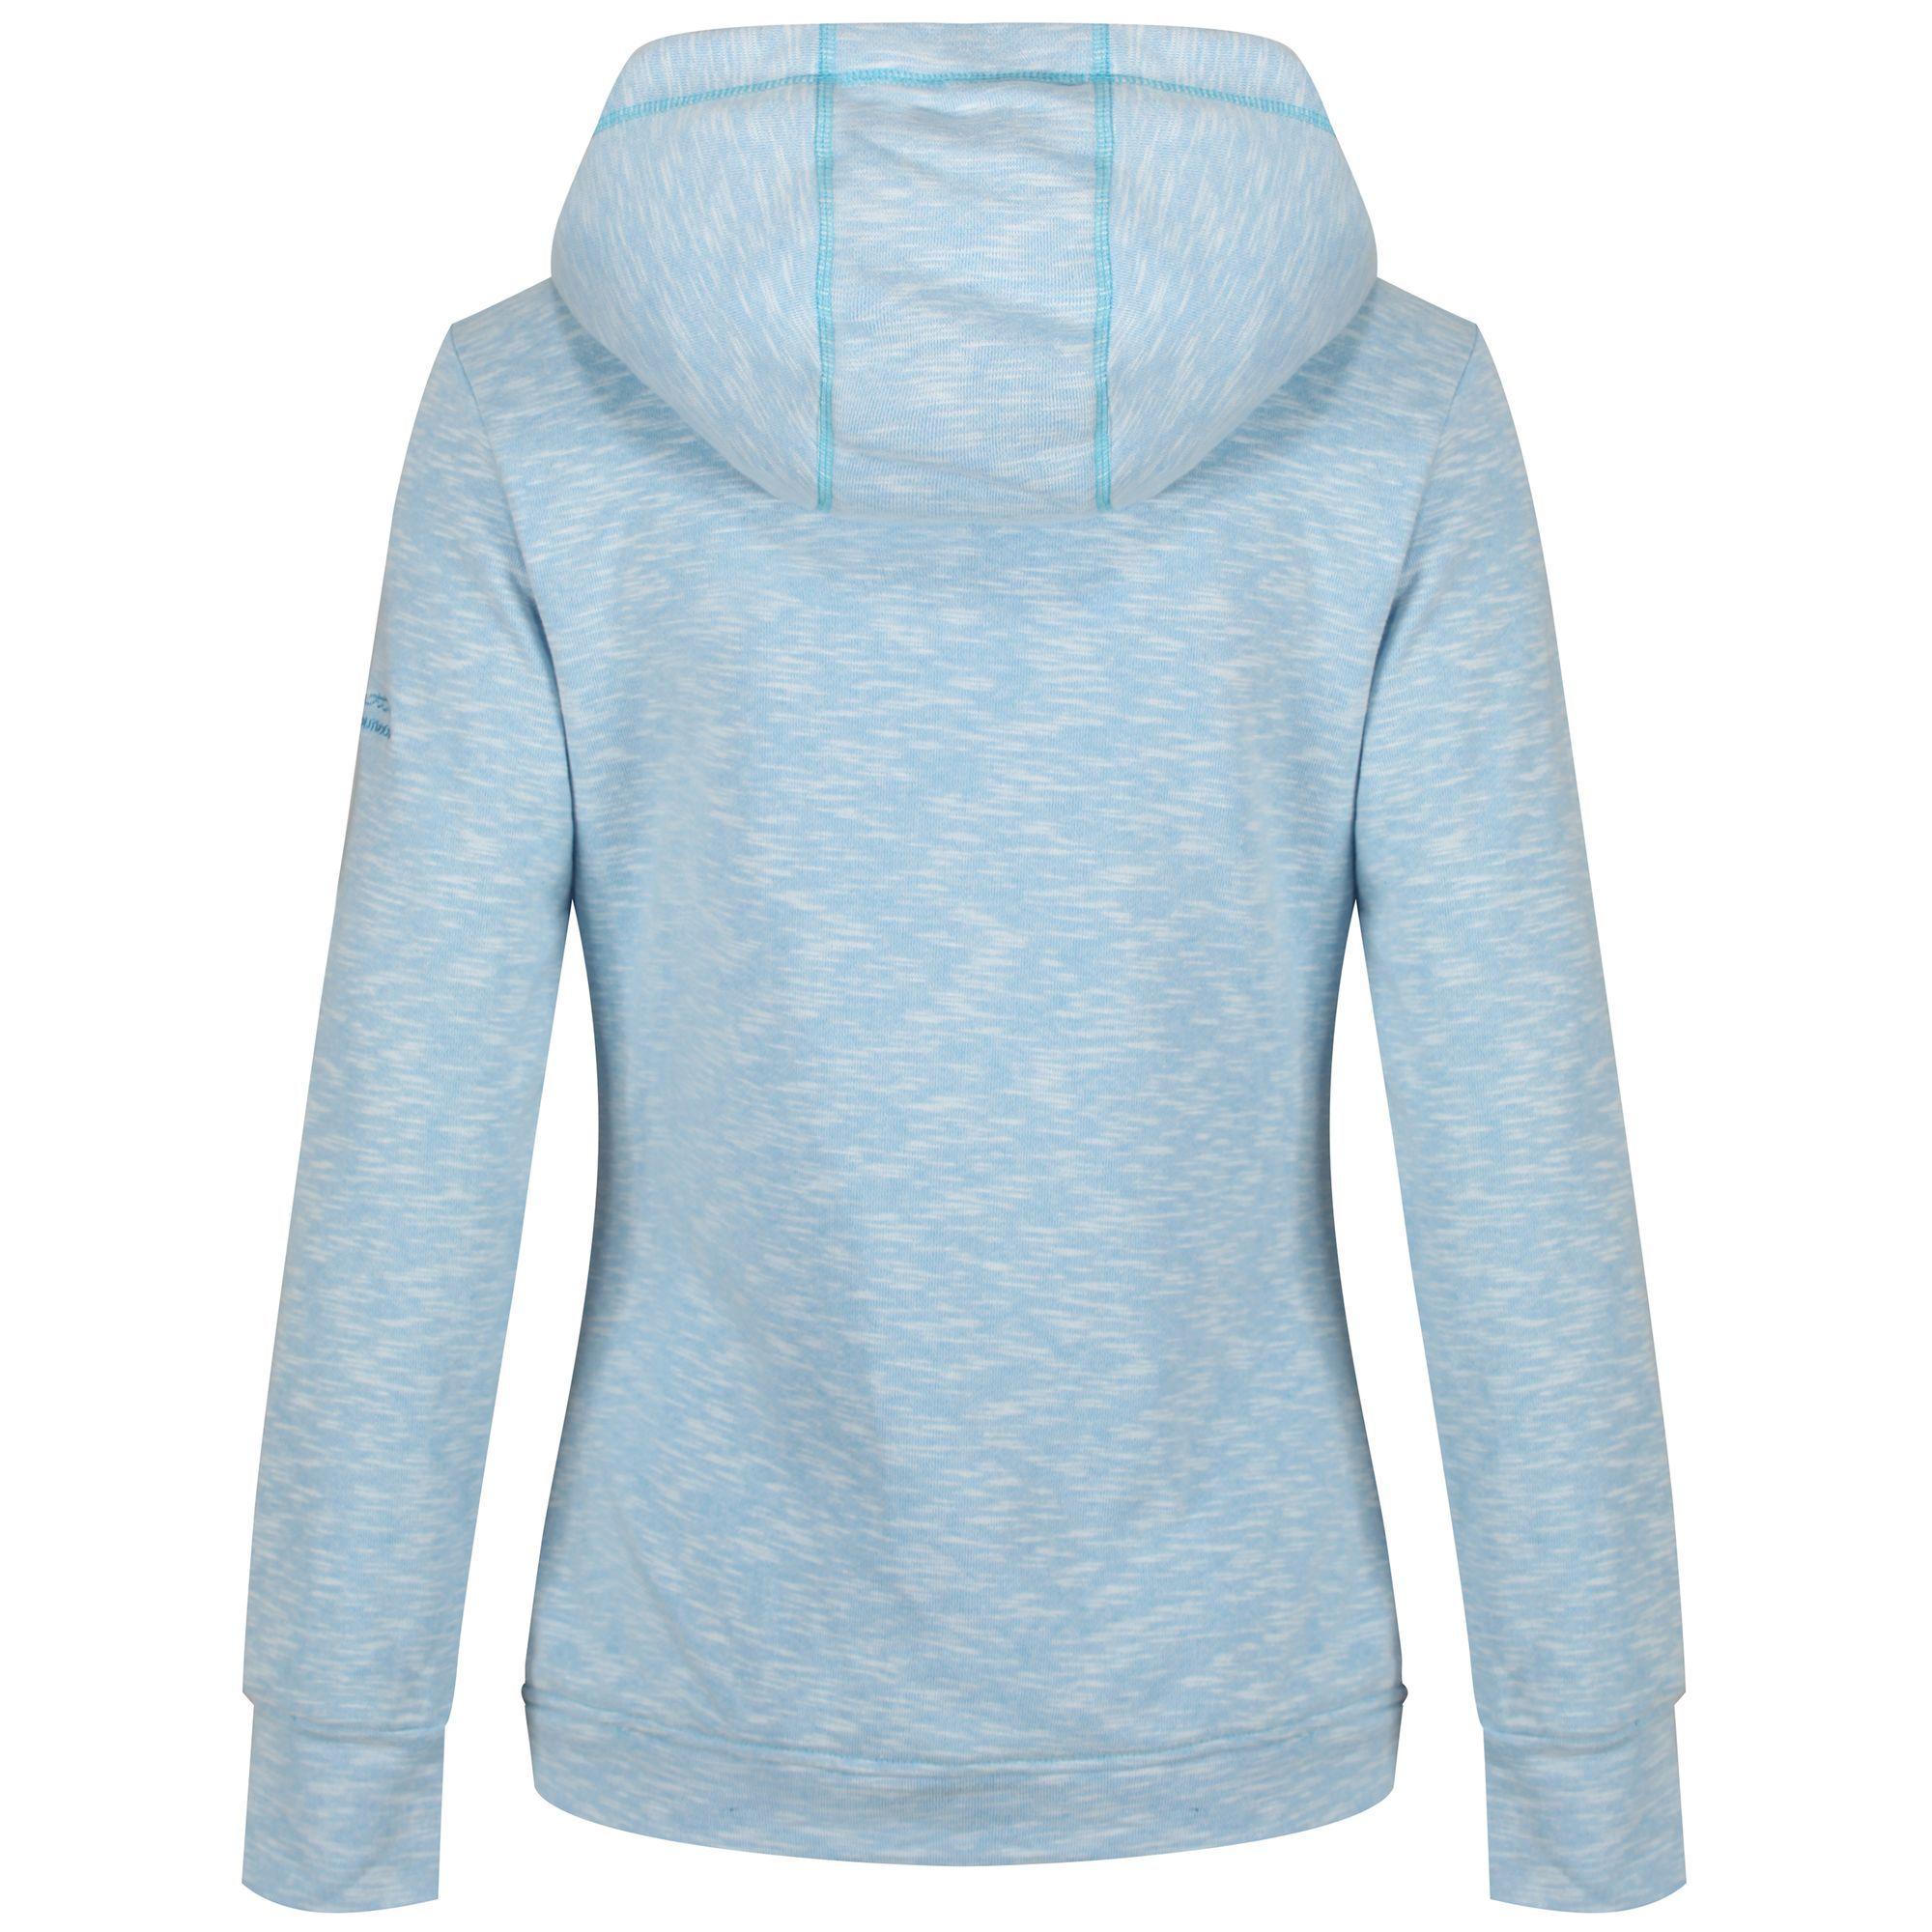 Regatta-Ramosa-Womens-Full-Zip-Hoodie-Hooded-Fleece-Jacket-RRP-50 thumbnail 13